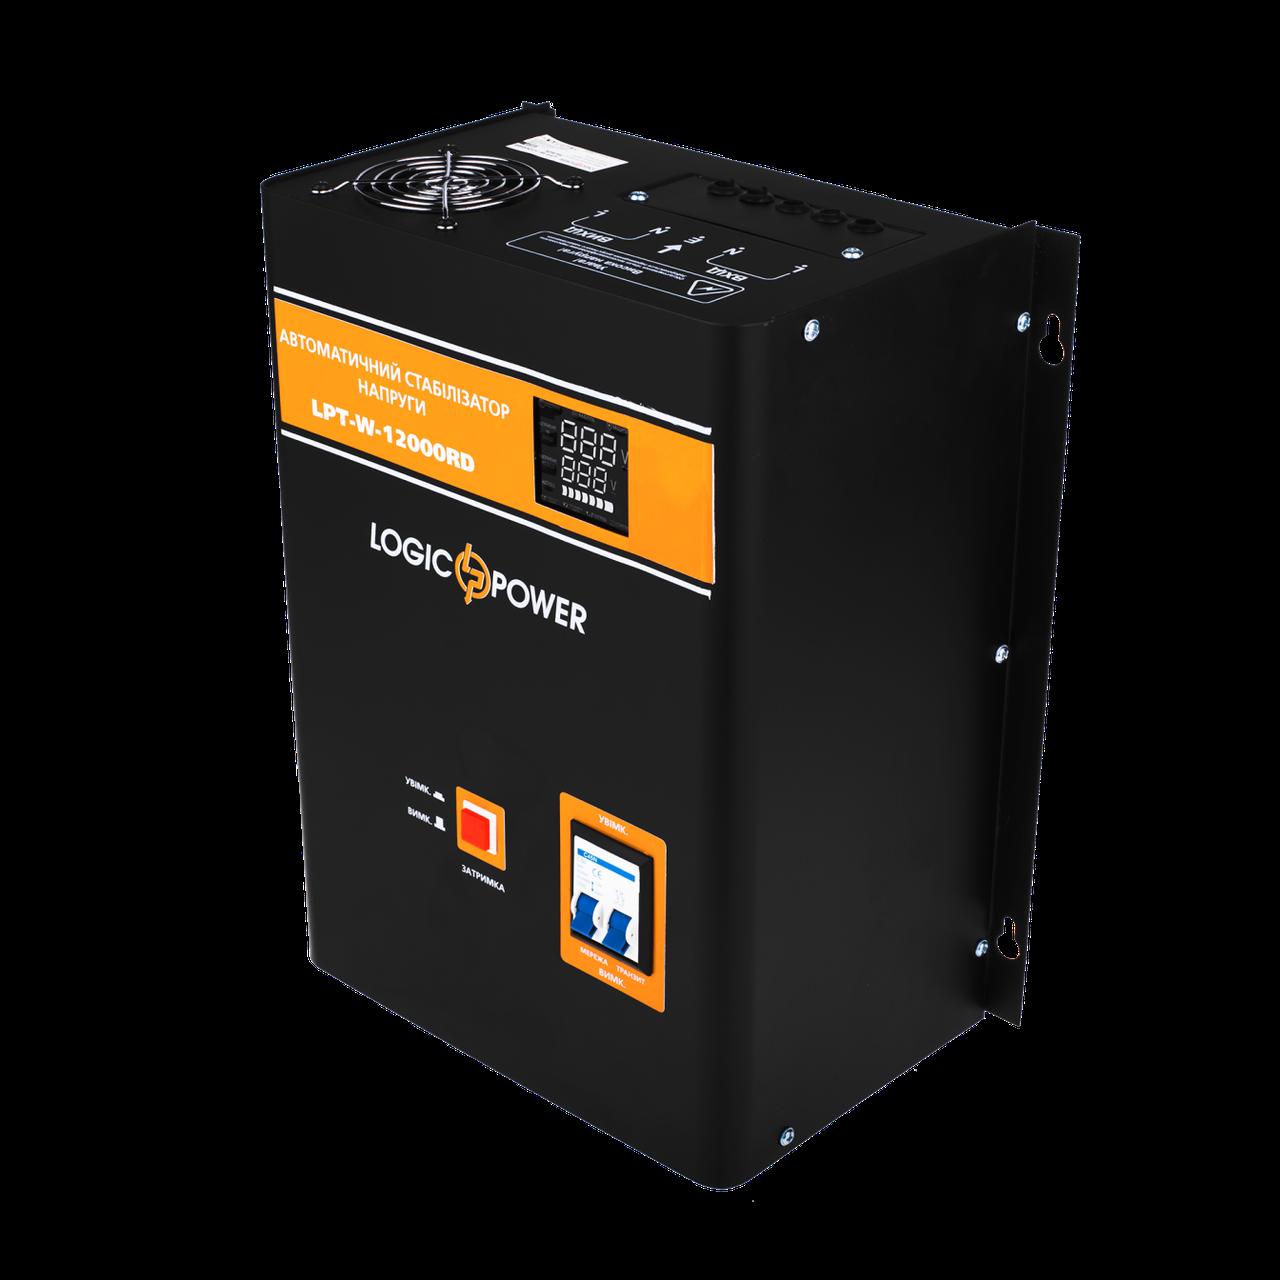 LogicPower LPT-W-12000RD (8400W) LCD